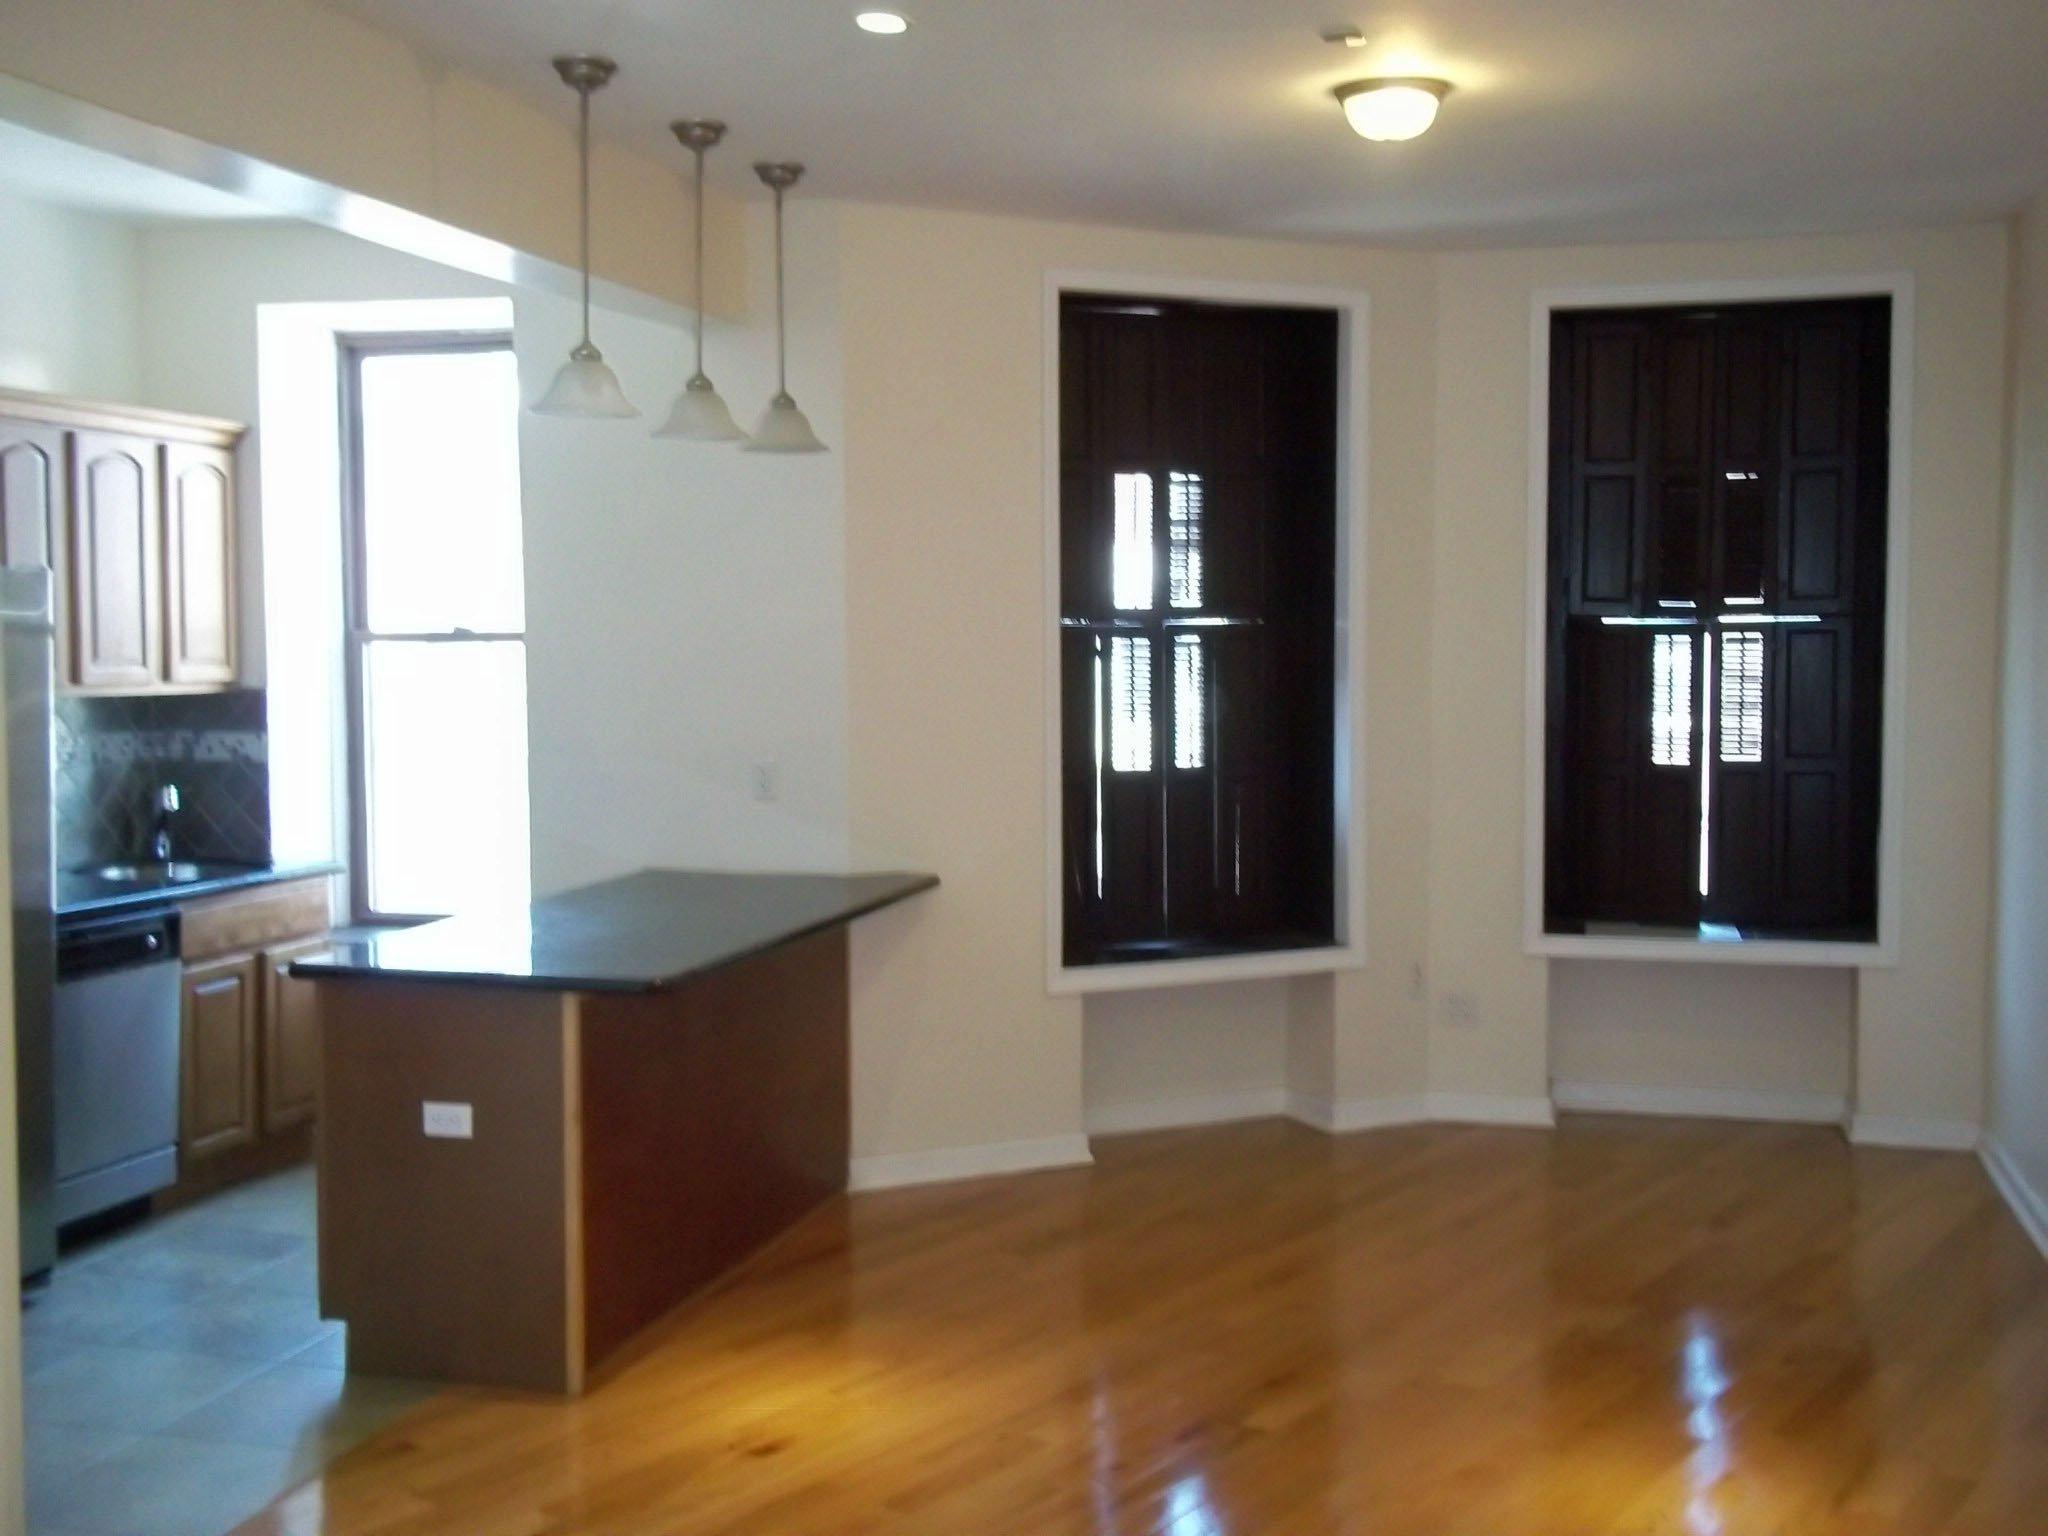 Bedford Stuyvesant 1 Bedroom Apartment For Rent Brooklyn Crg3051